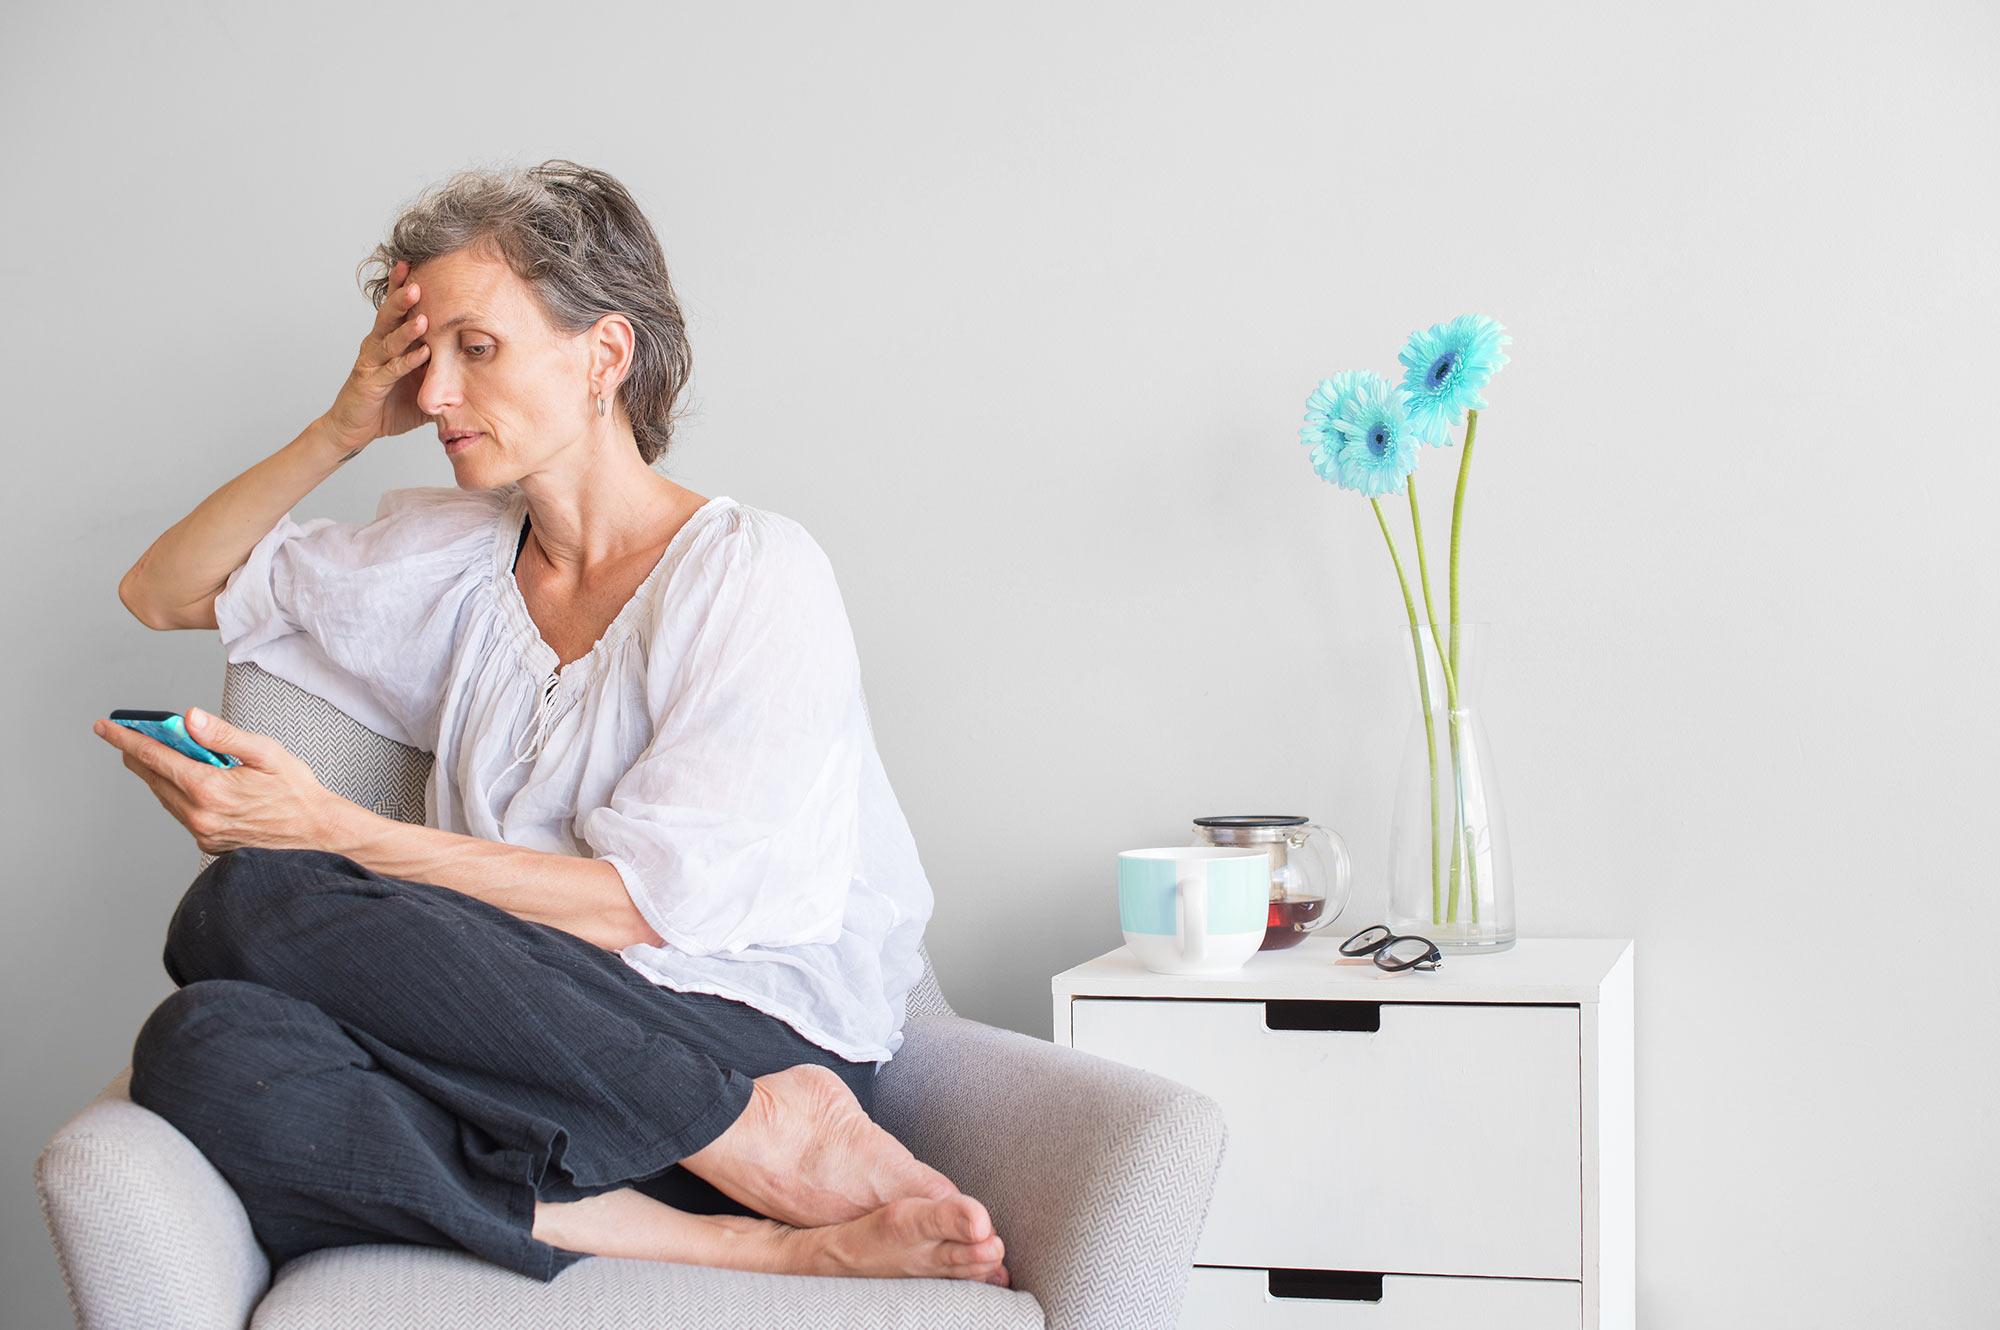 Coronavirus Anxiety: 3 Tips to Keep Calm and Carry On